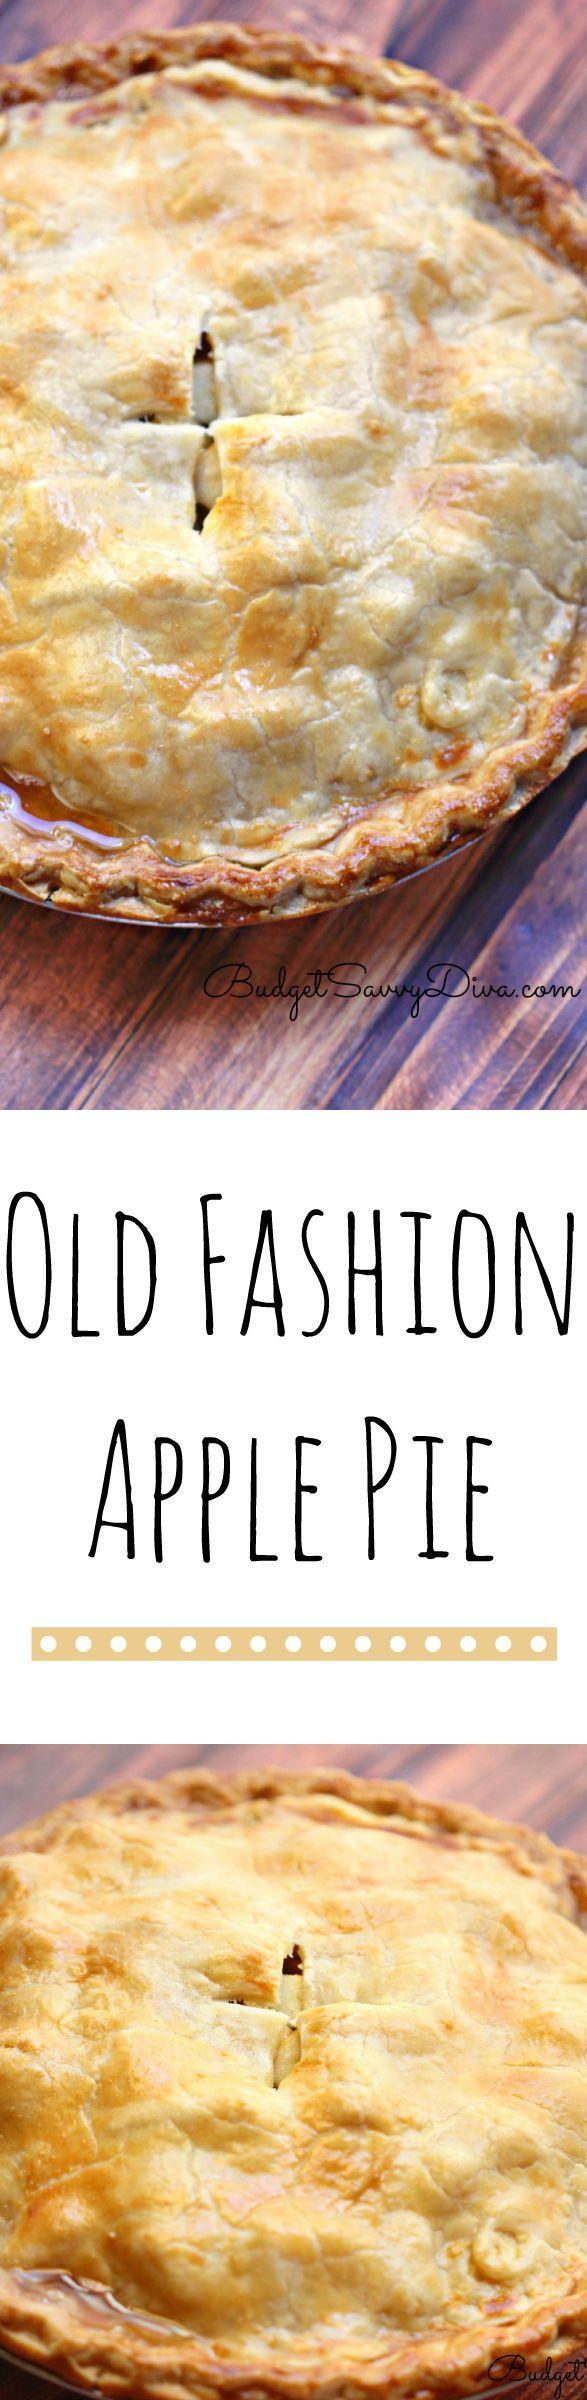 Apple Pie Recipe #LoveAmericanHome | Recipe | Food | Apple ...